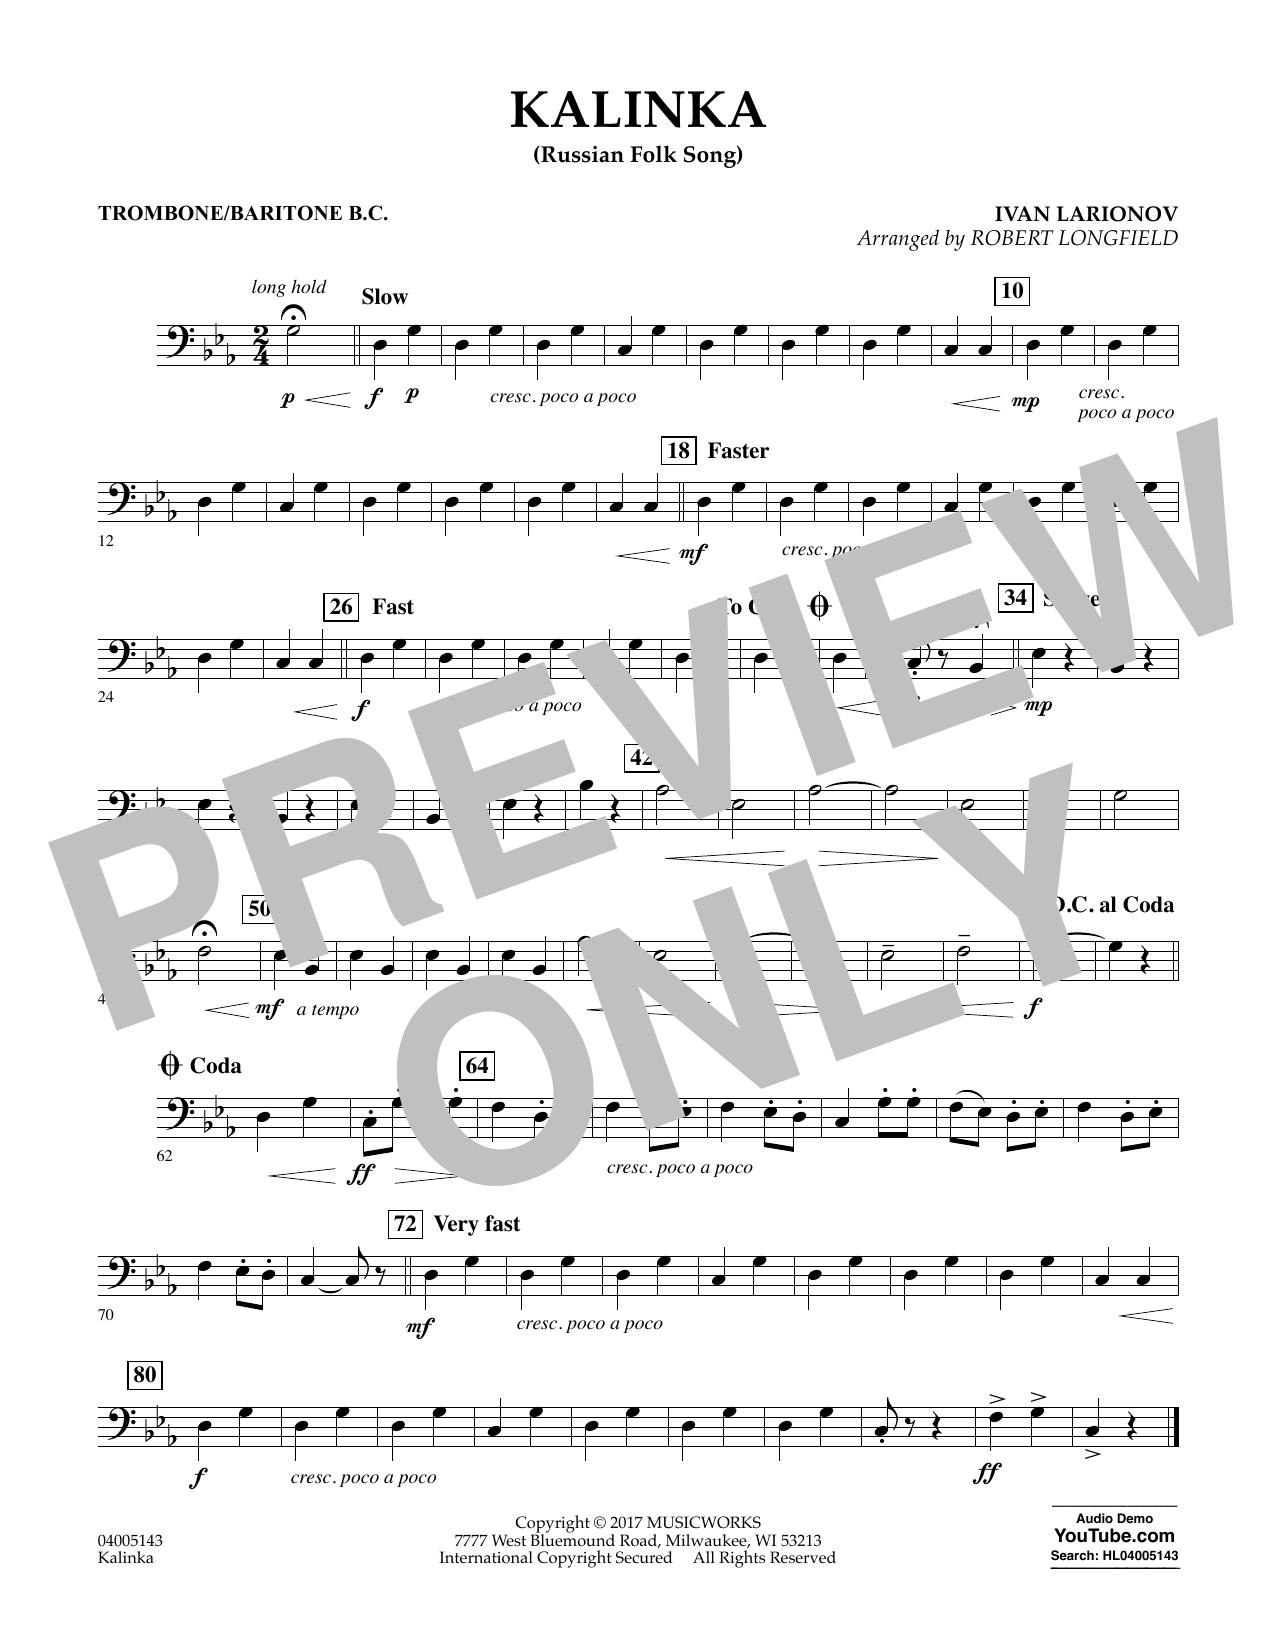 Robert Longfield Kalinka (Russian Folk Song) - Trombone/Baritone B.C. sheet music notes and chords. Download Printable PDF.